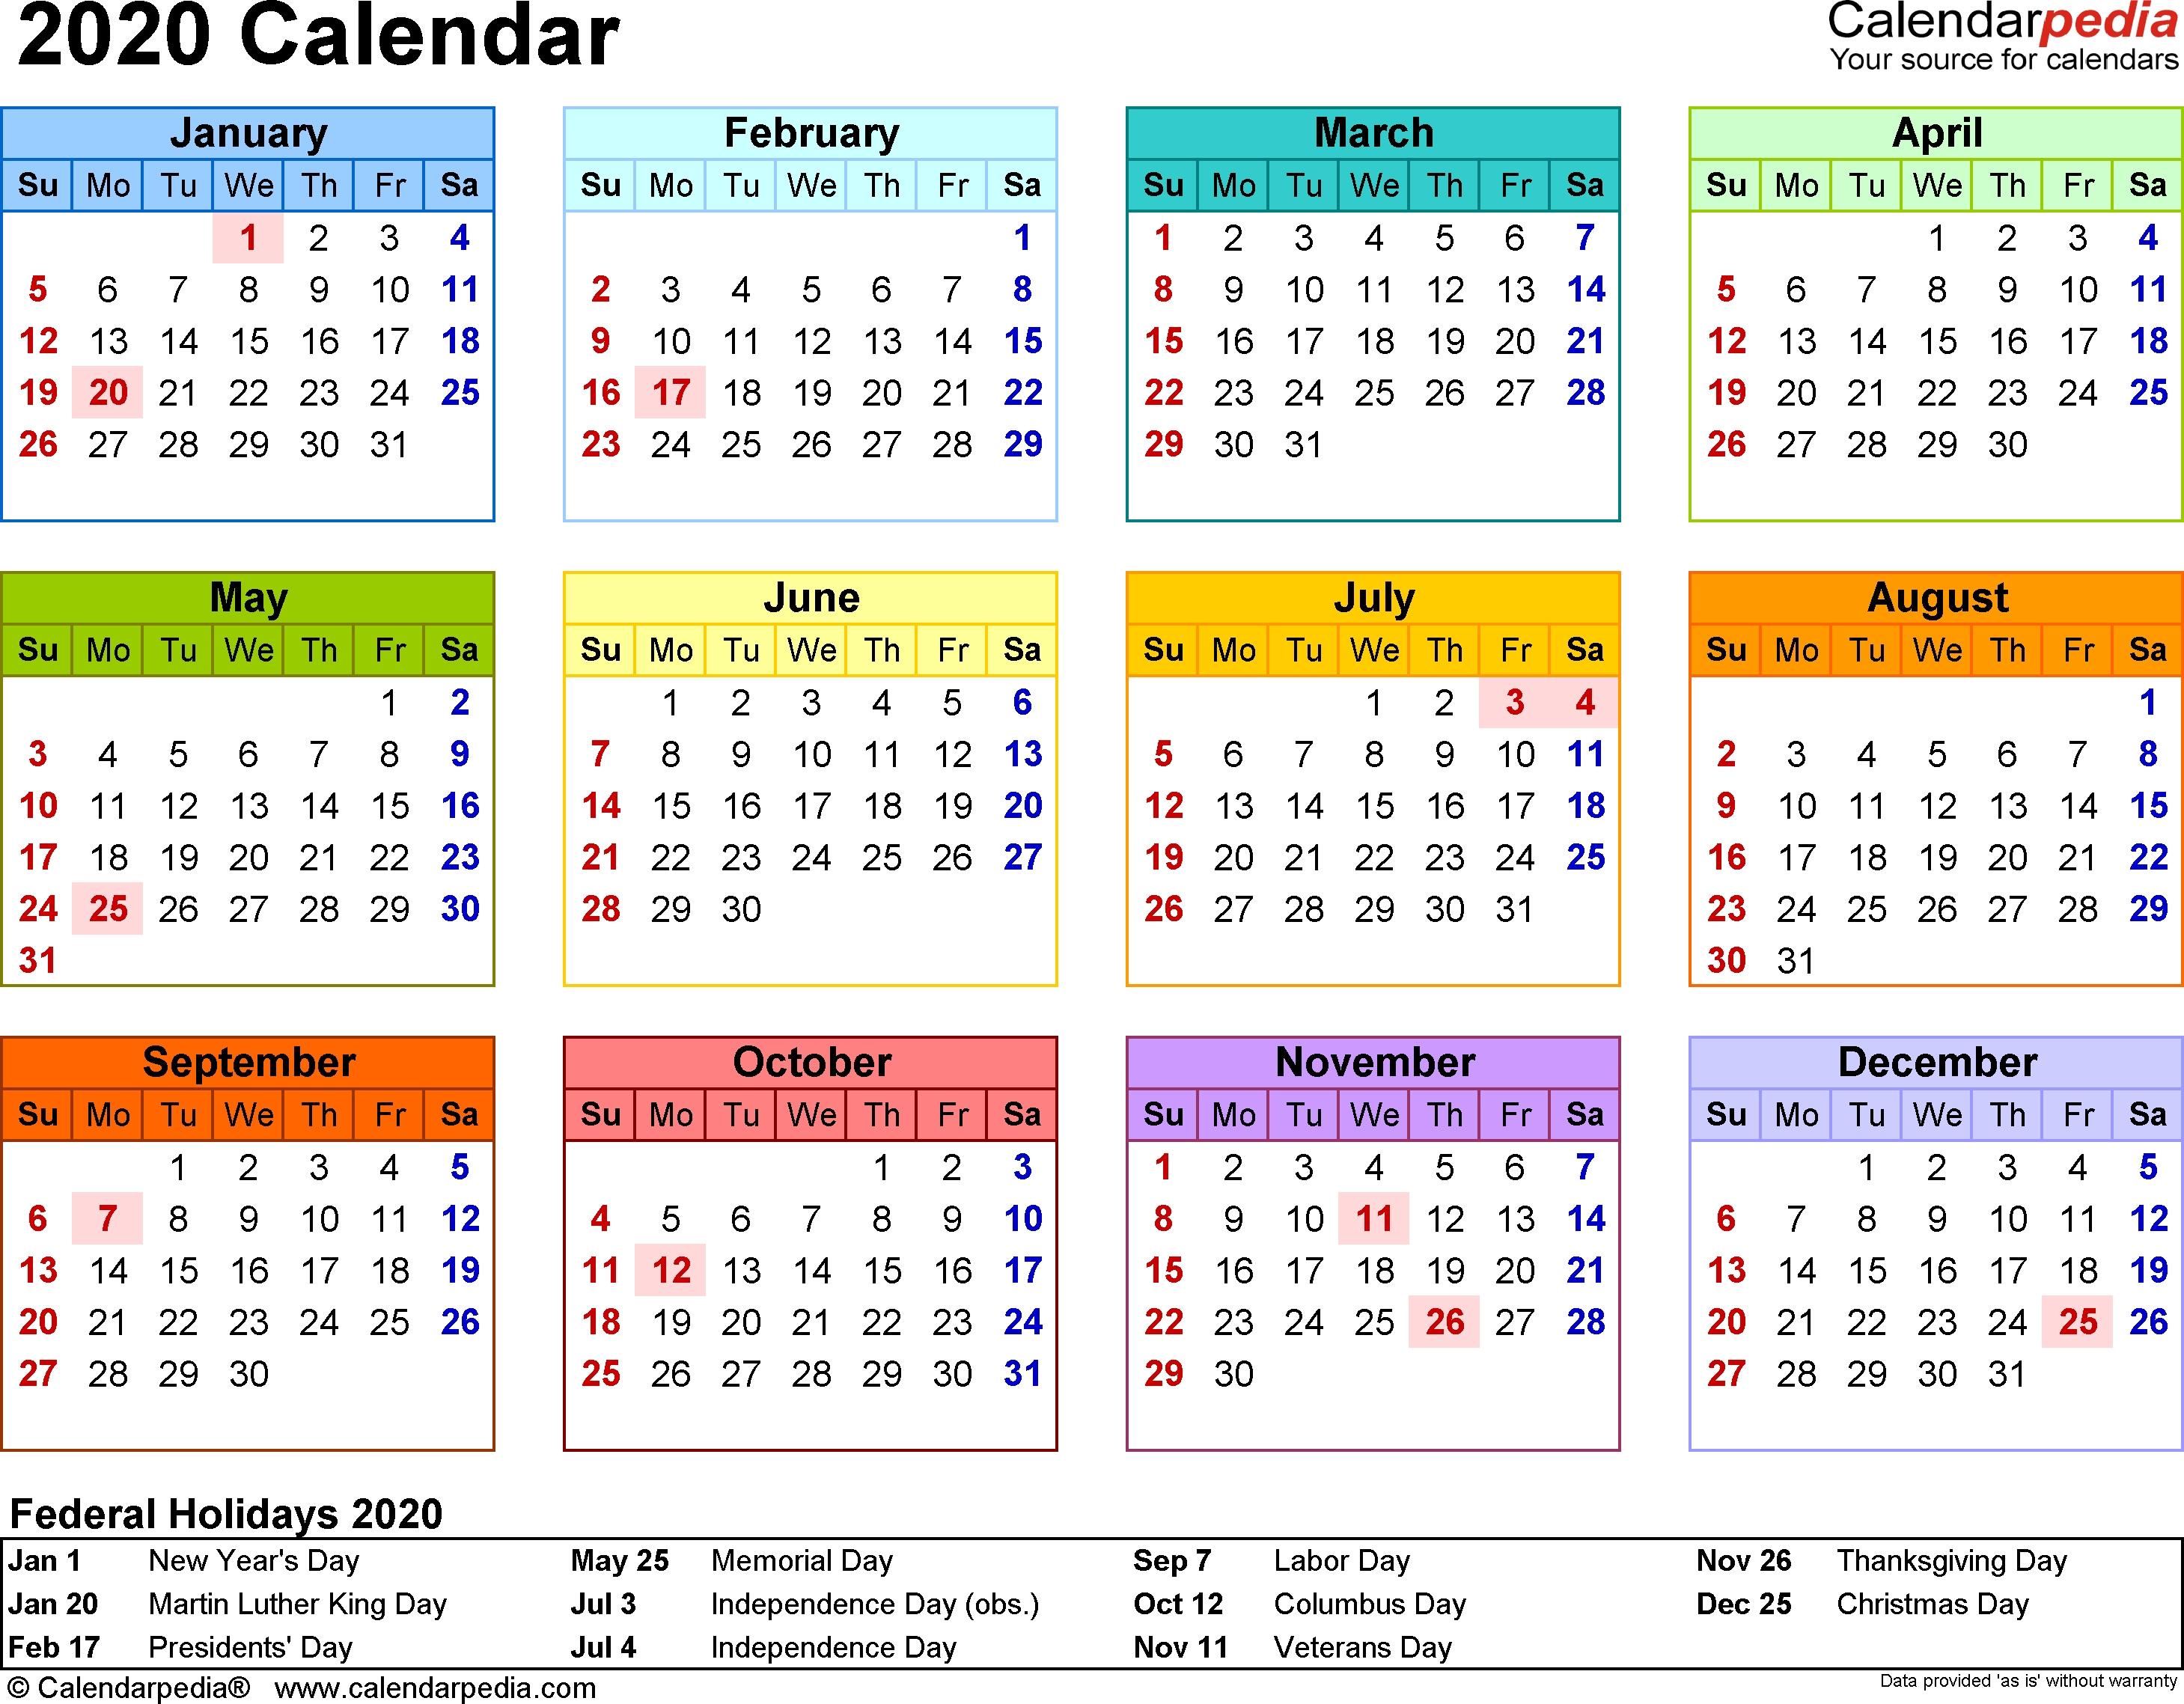 2020 Calendar - Download 17 Free Printable Excel Templates (.xlsx) within 4-4-5 Calendar 2020